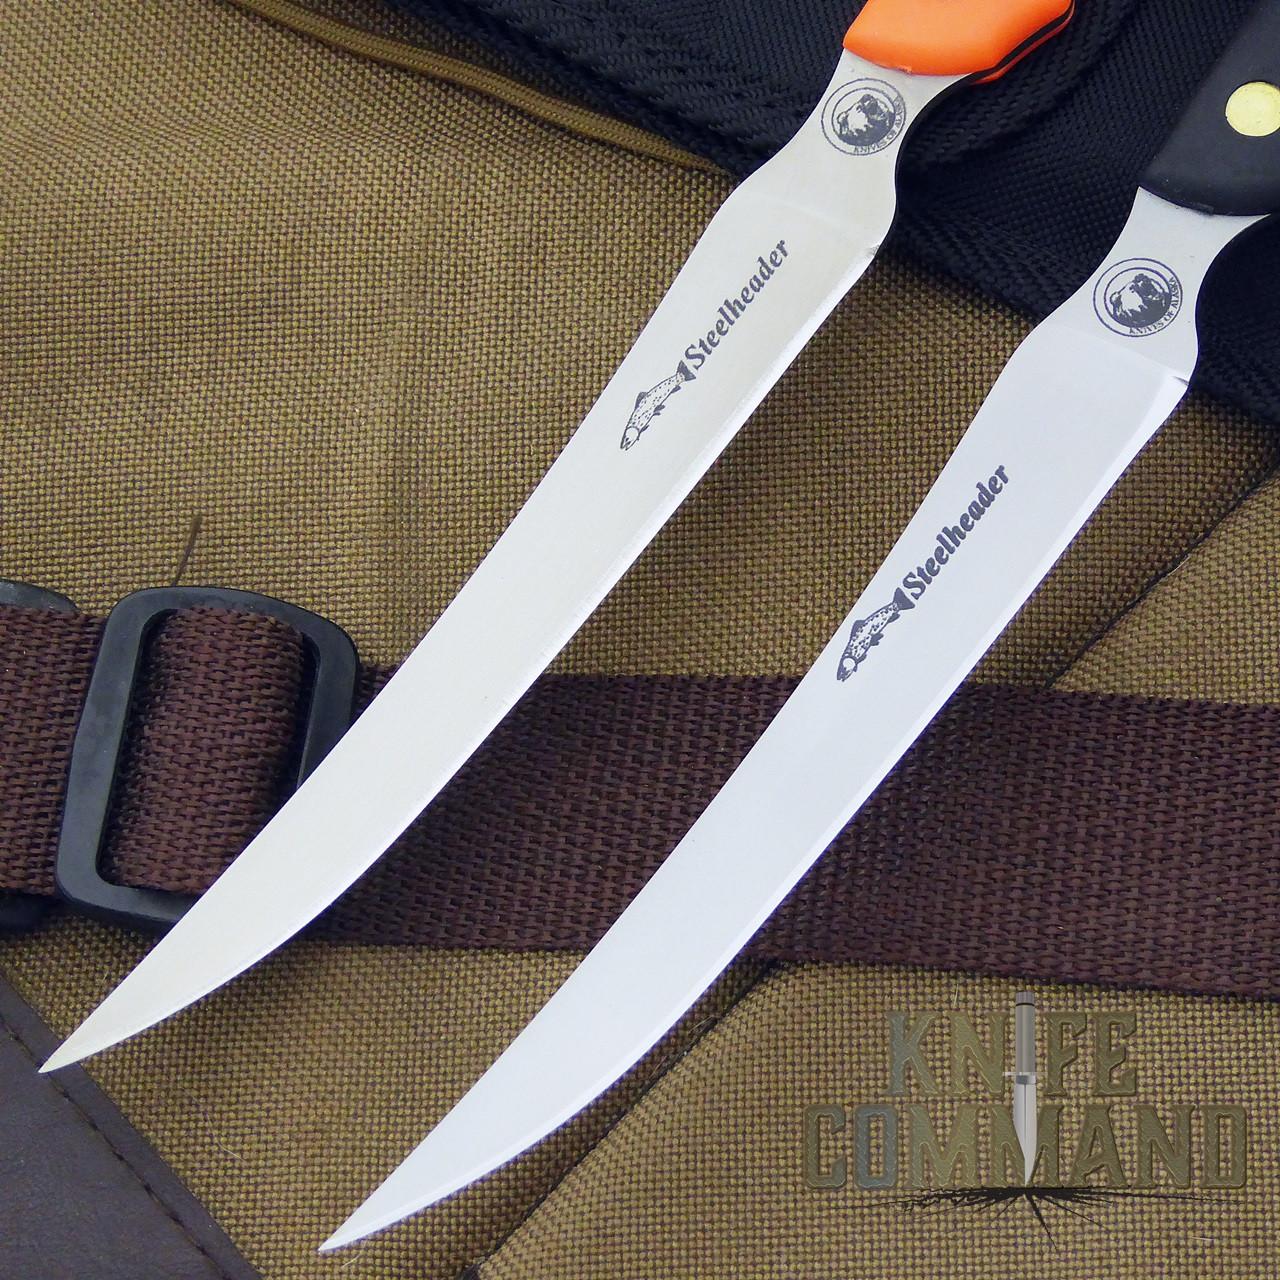 Knives of Alaska Steelheader Fillet Knife.  440C stainless steel blade.